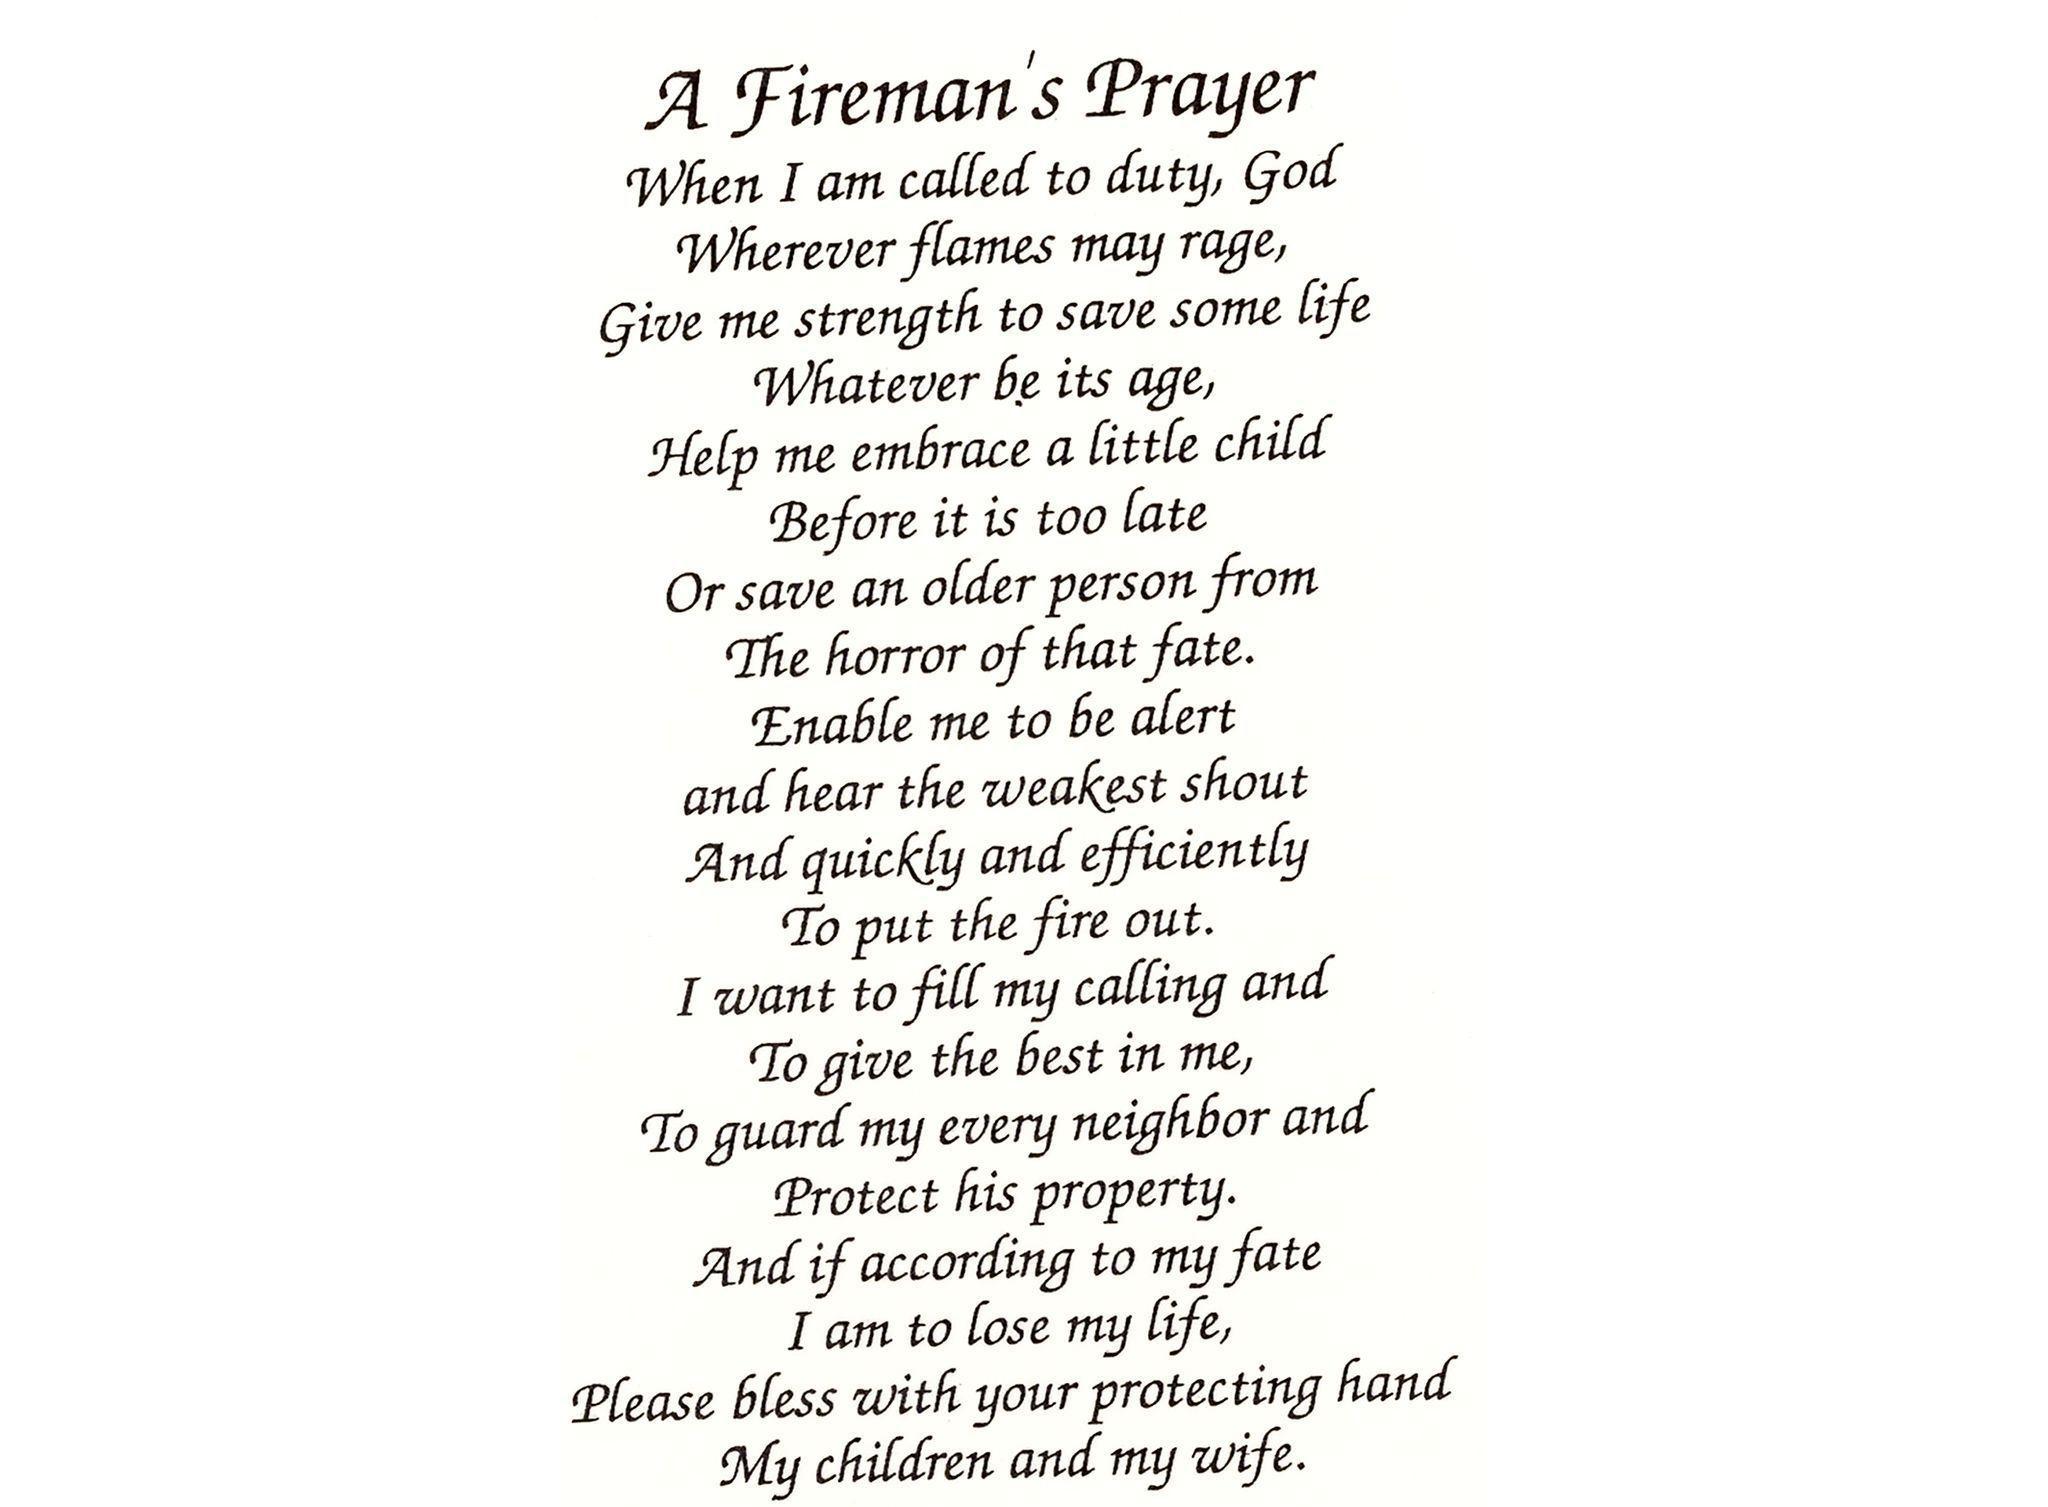 Z 324 Fireman's Prayer soulmateprayer Fireman's prayer